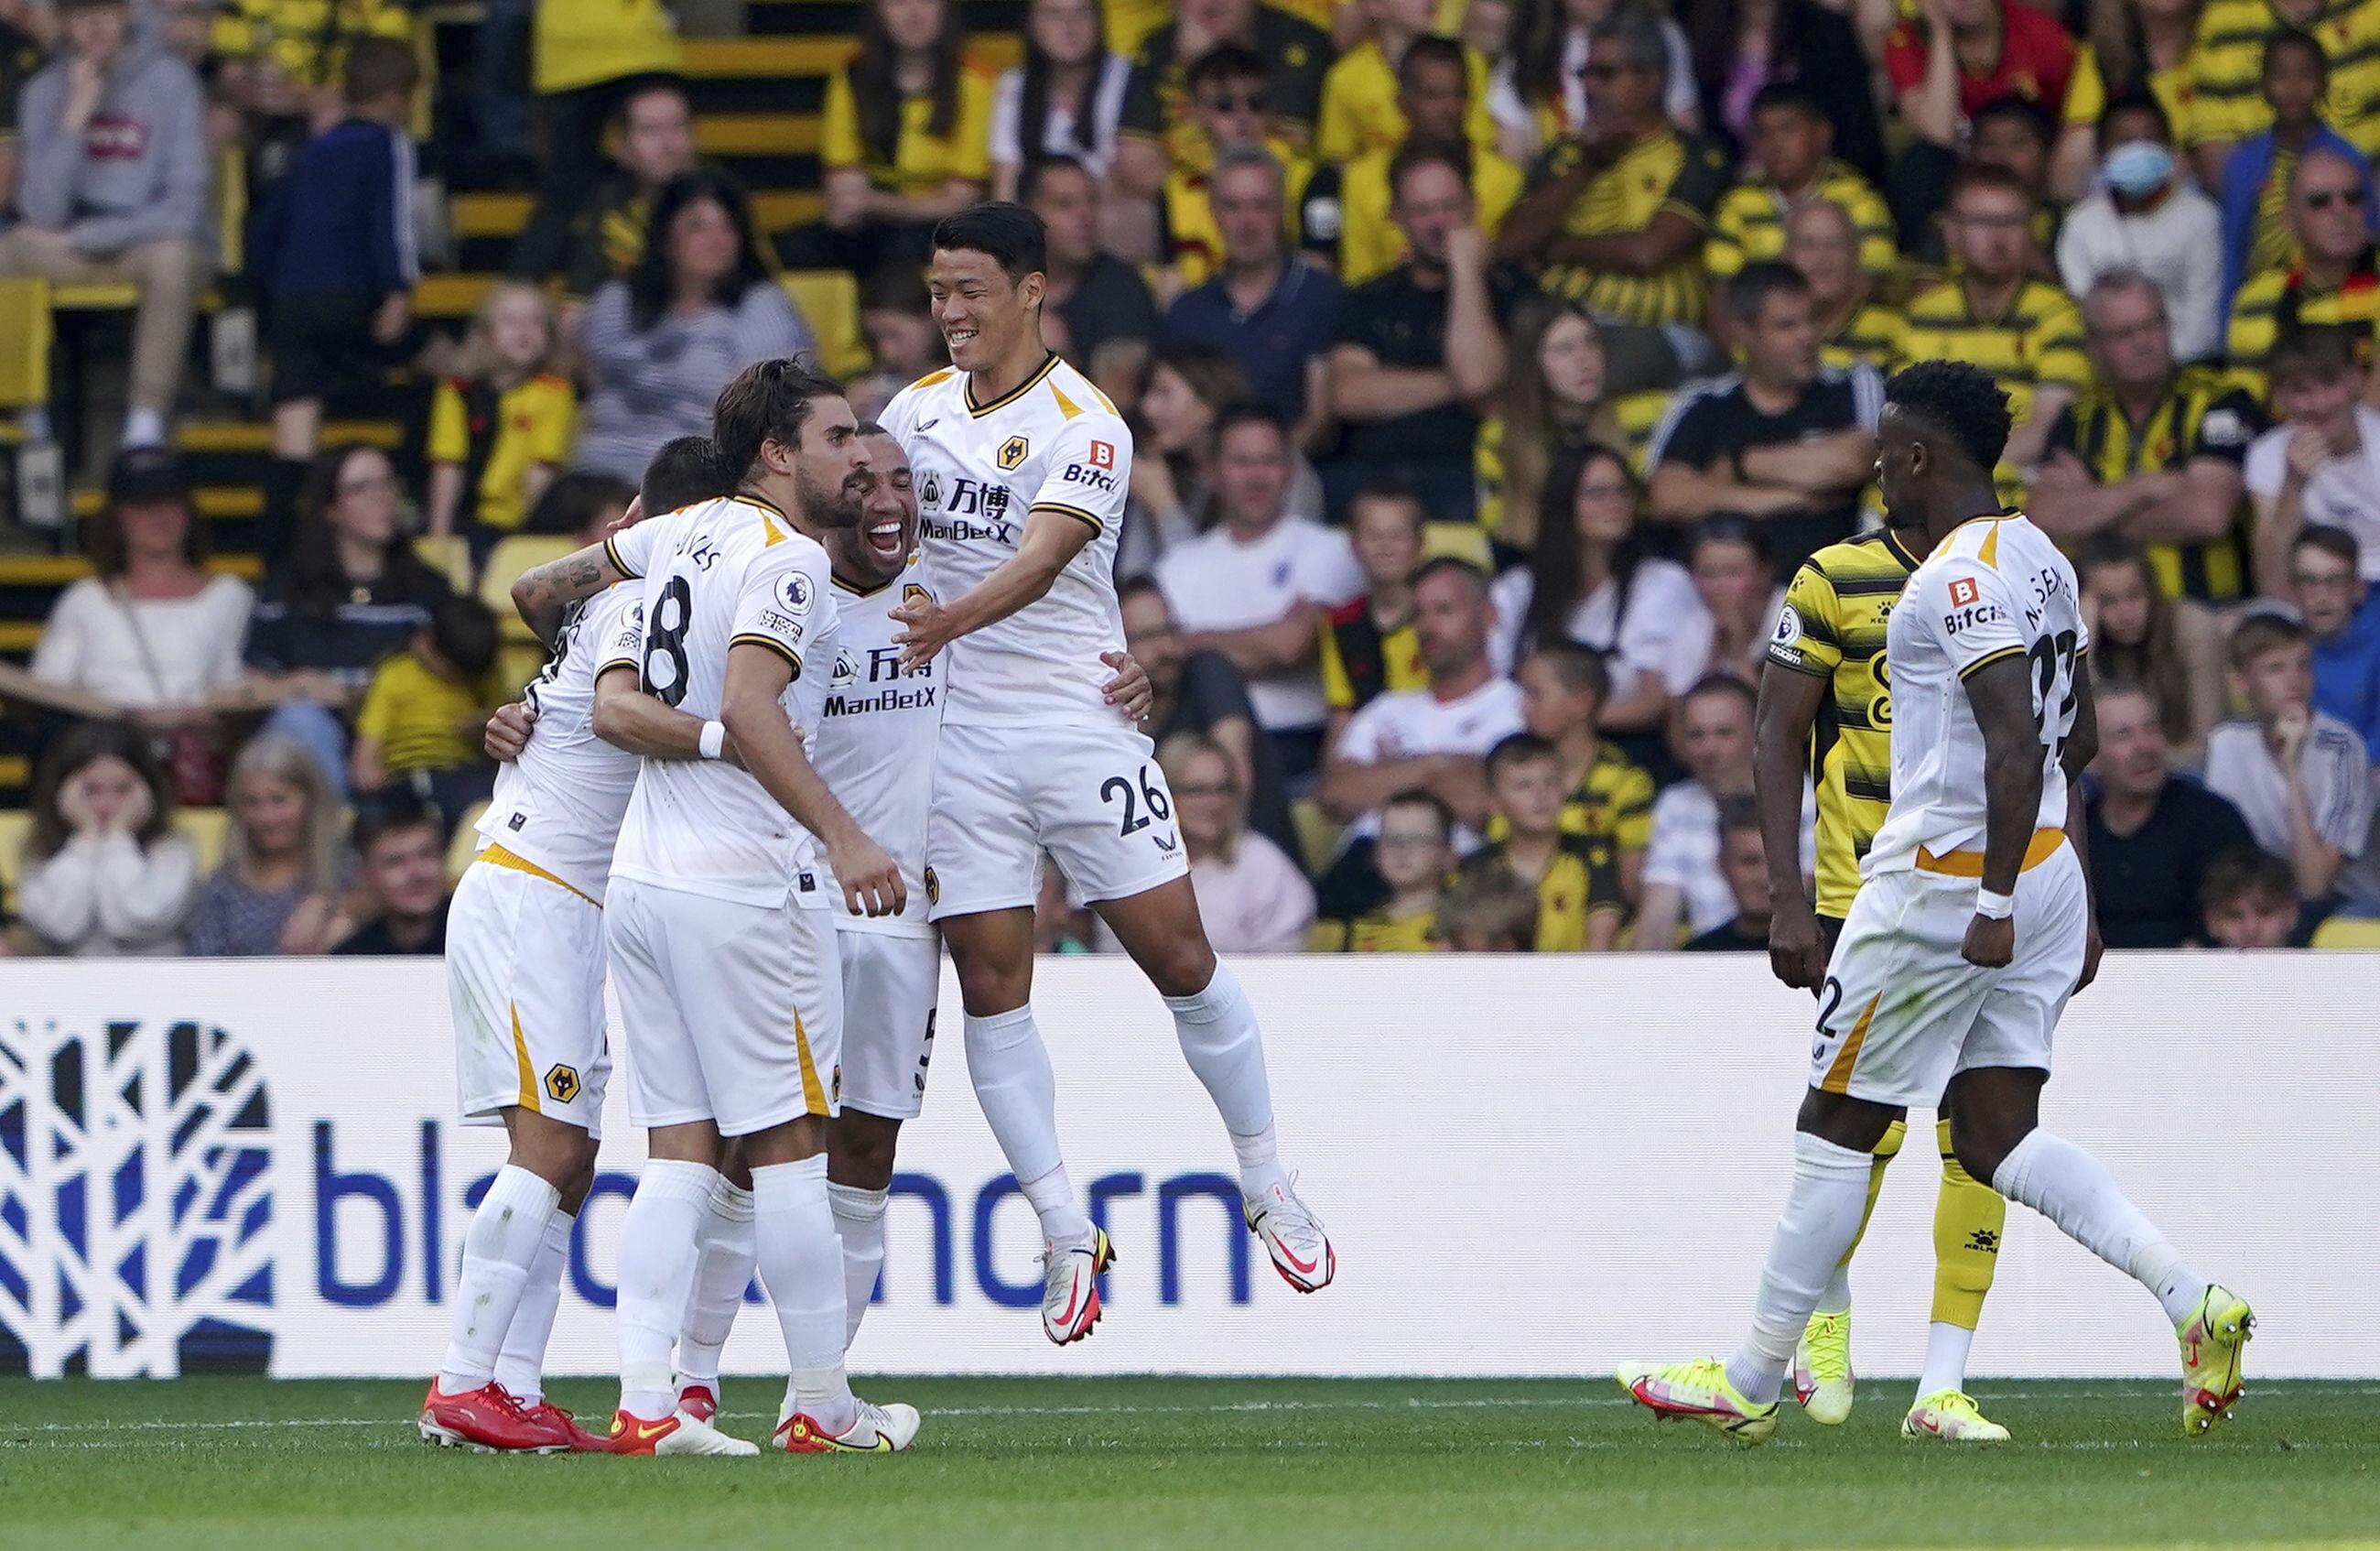 SKorea's Hwang scores as Wolves finally earn first EPL win - Associated Press